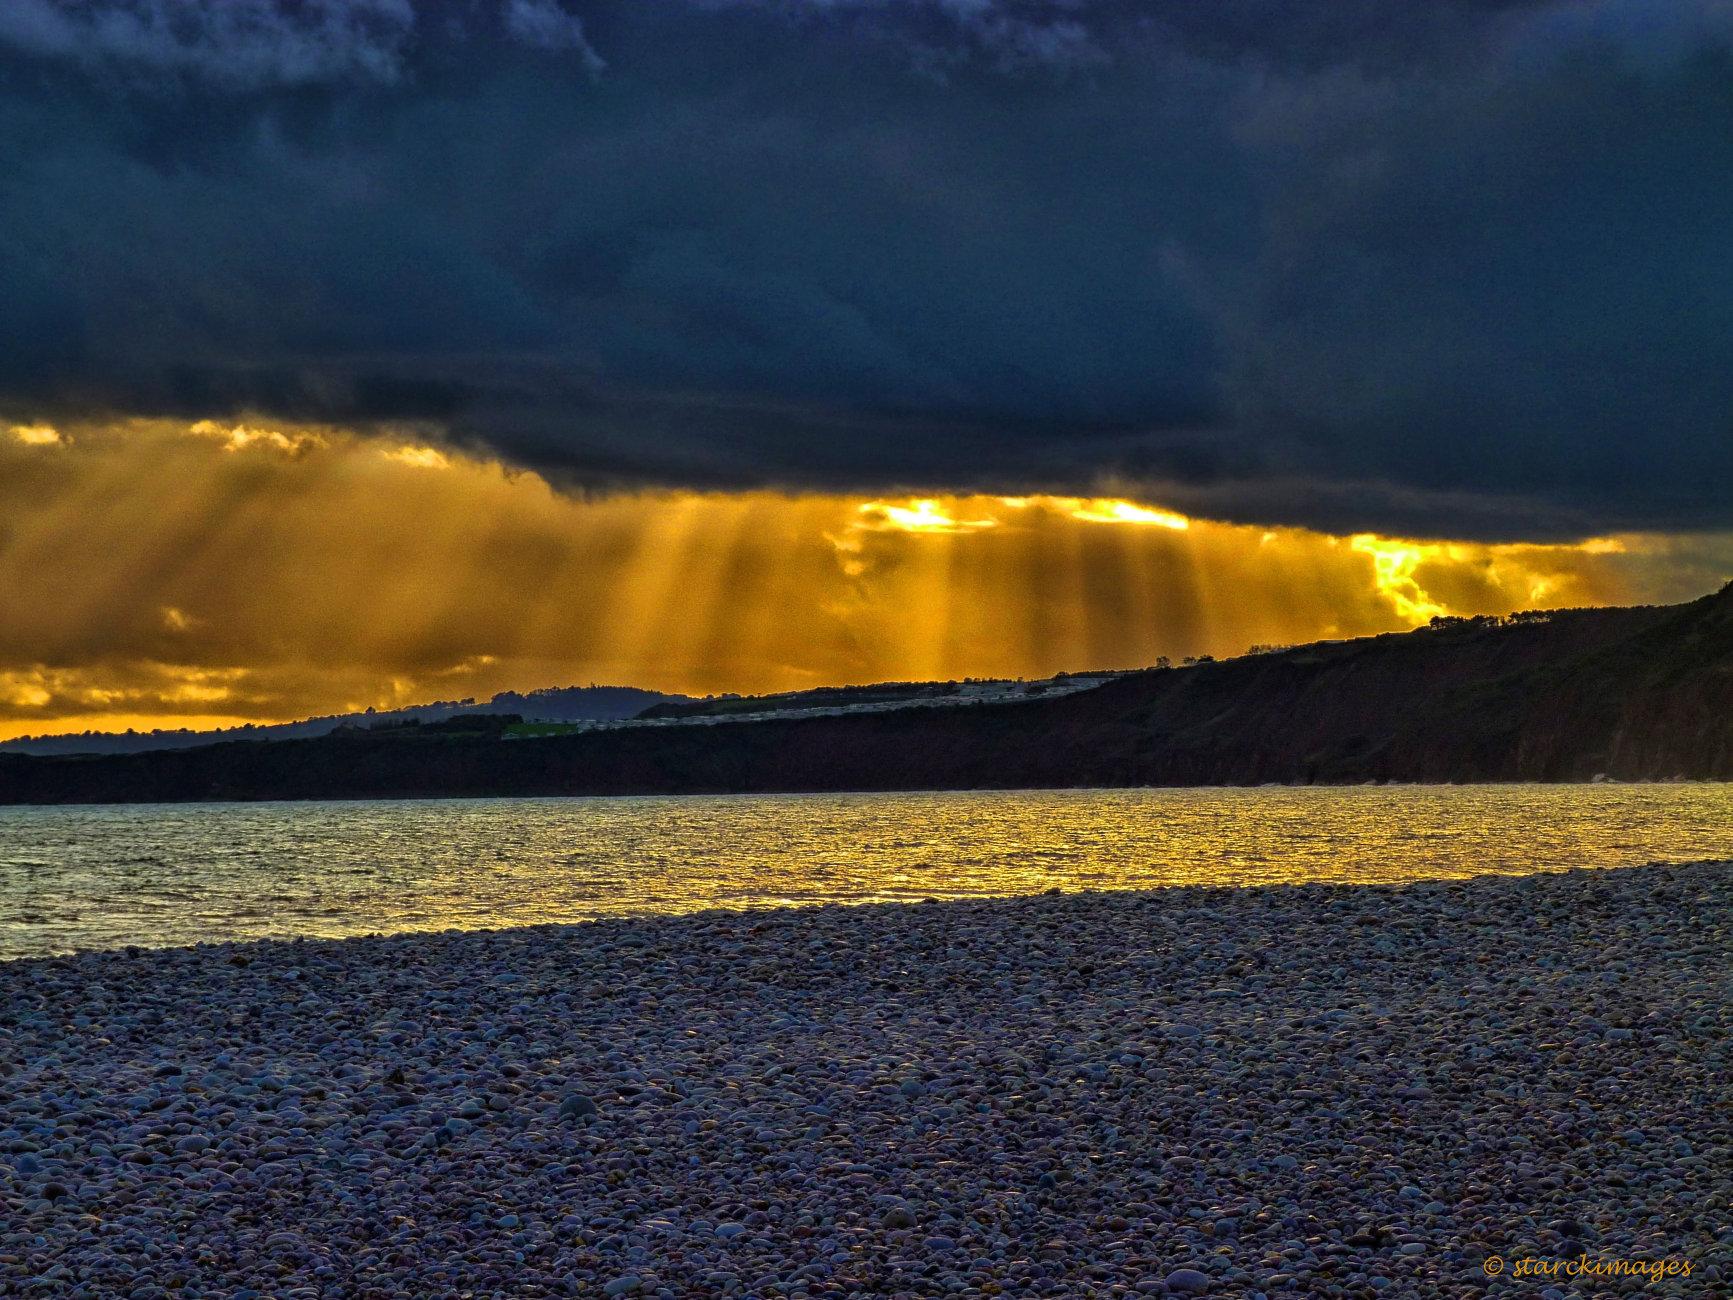 Budleigh Salterton Sunbeams